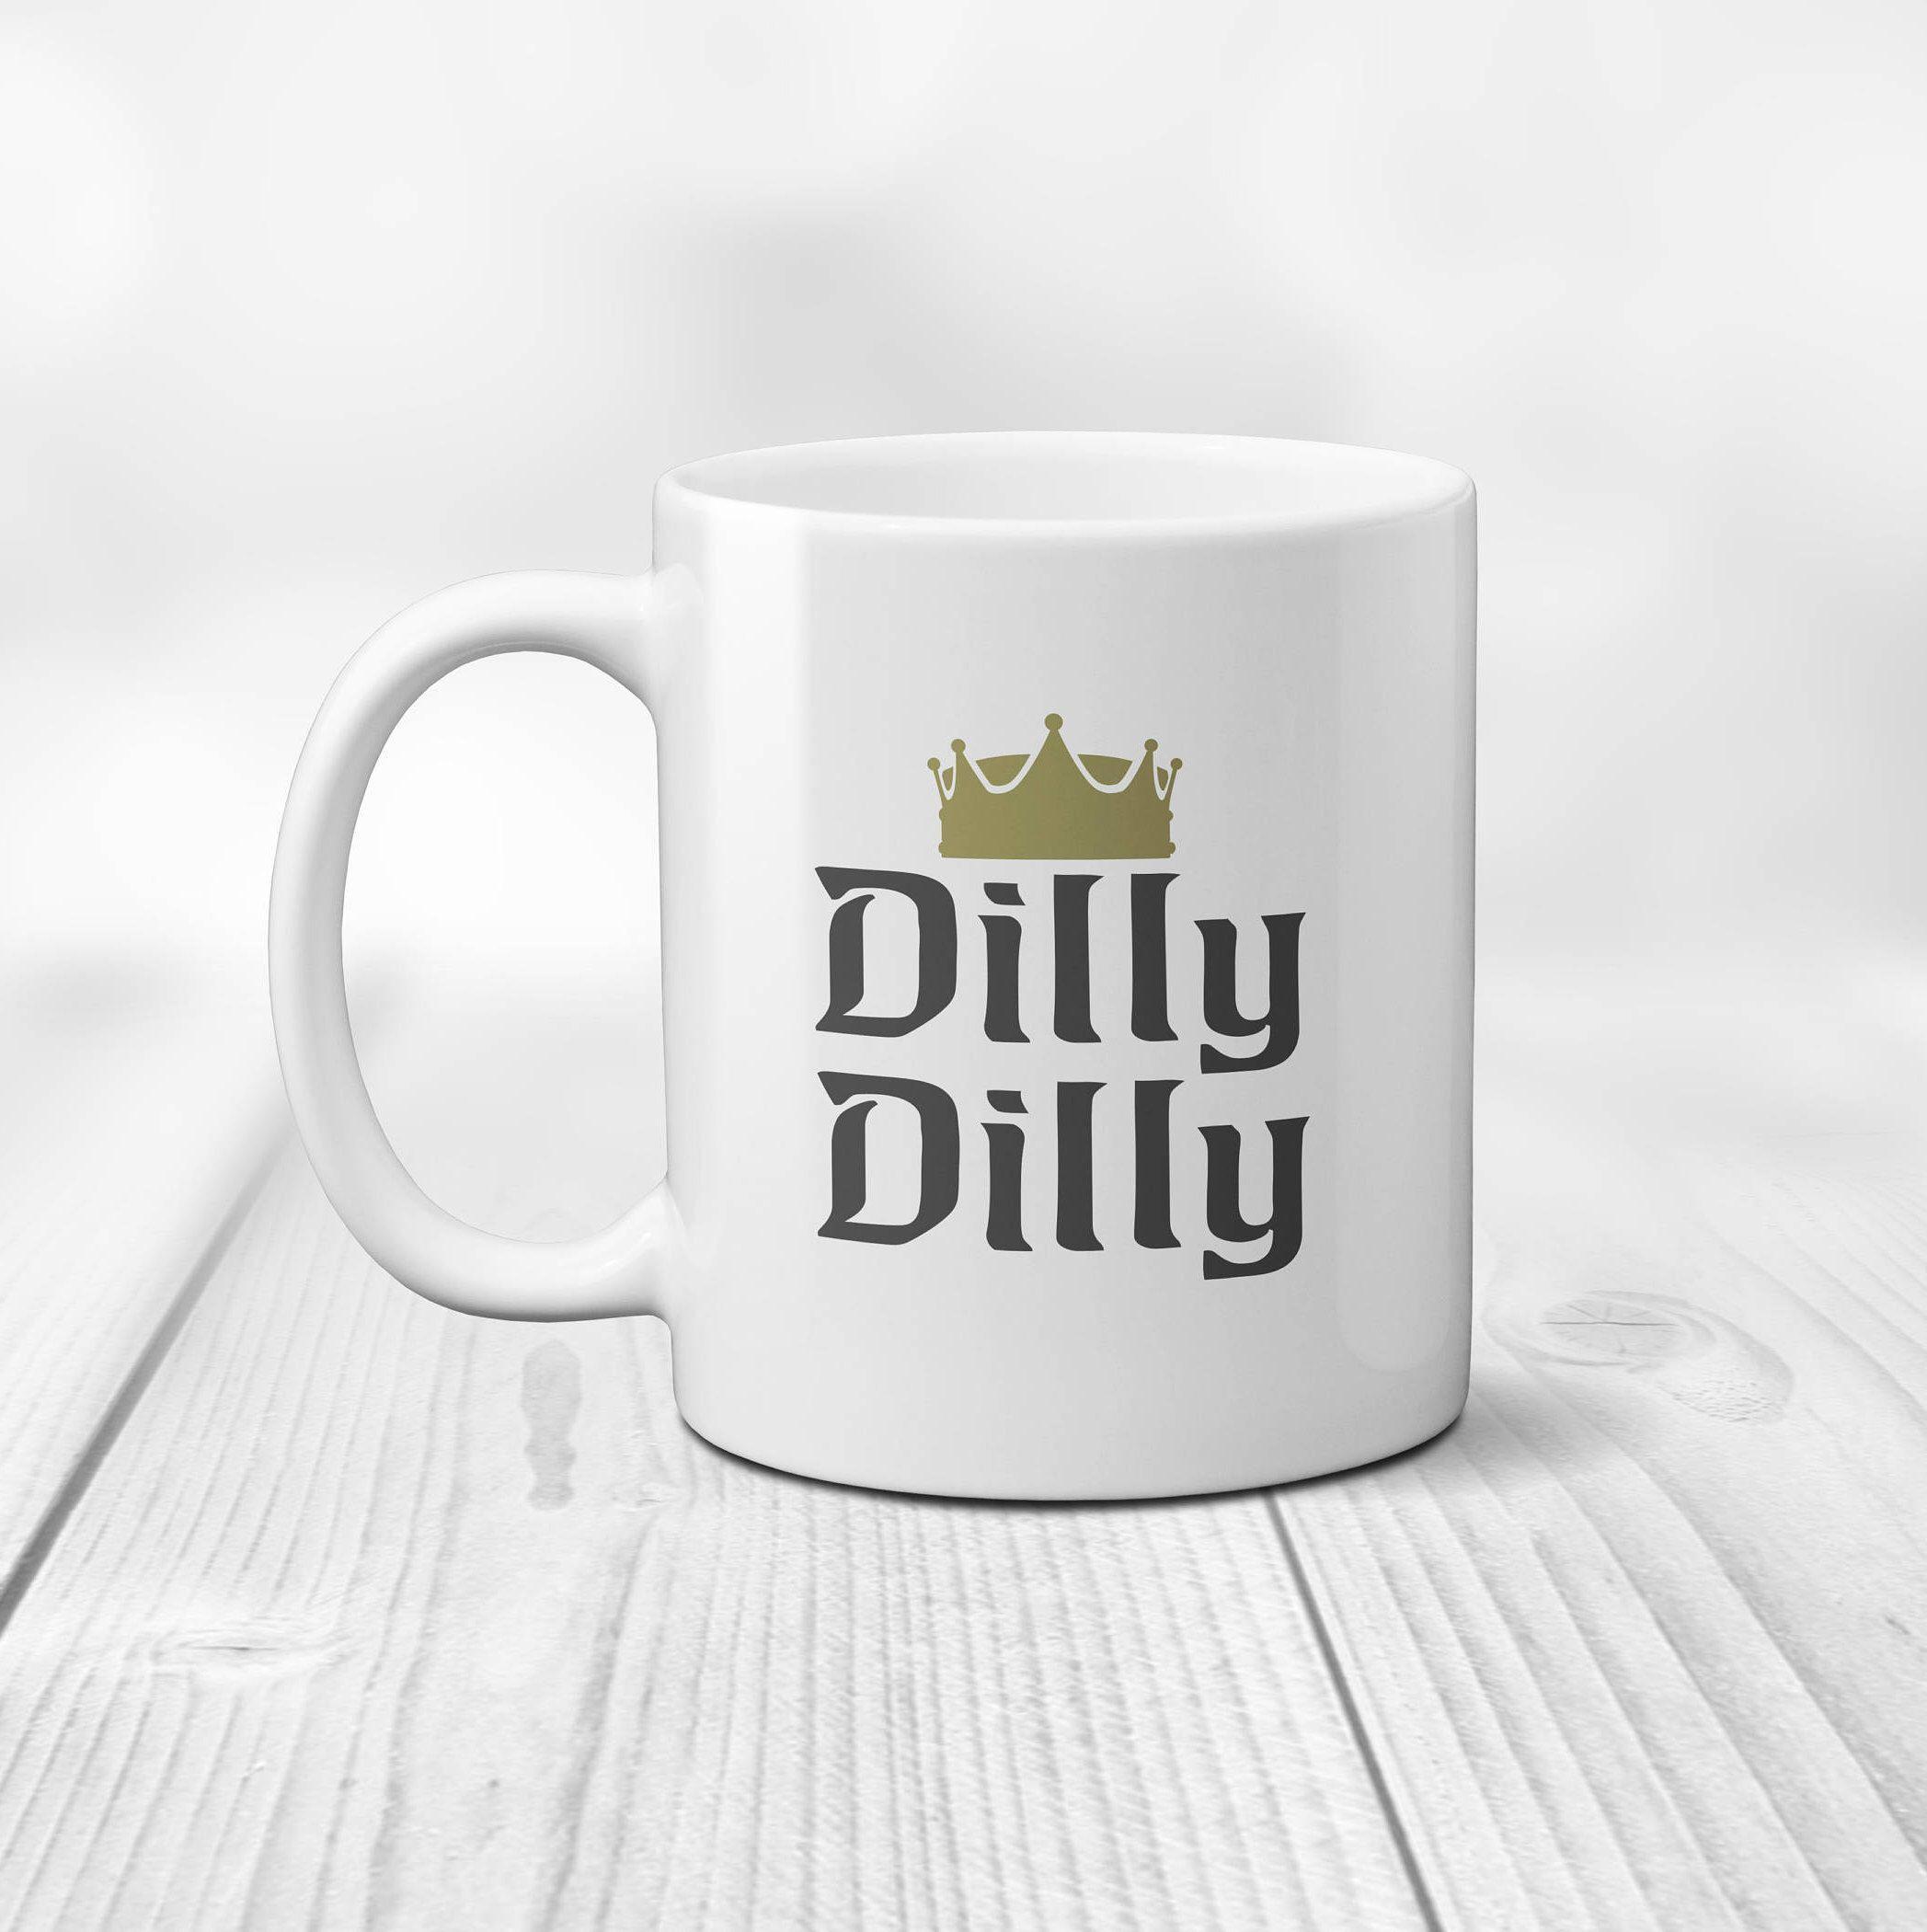 Pin by Kity Katt on lol or omg Funny coffee mugs, Coffee